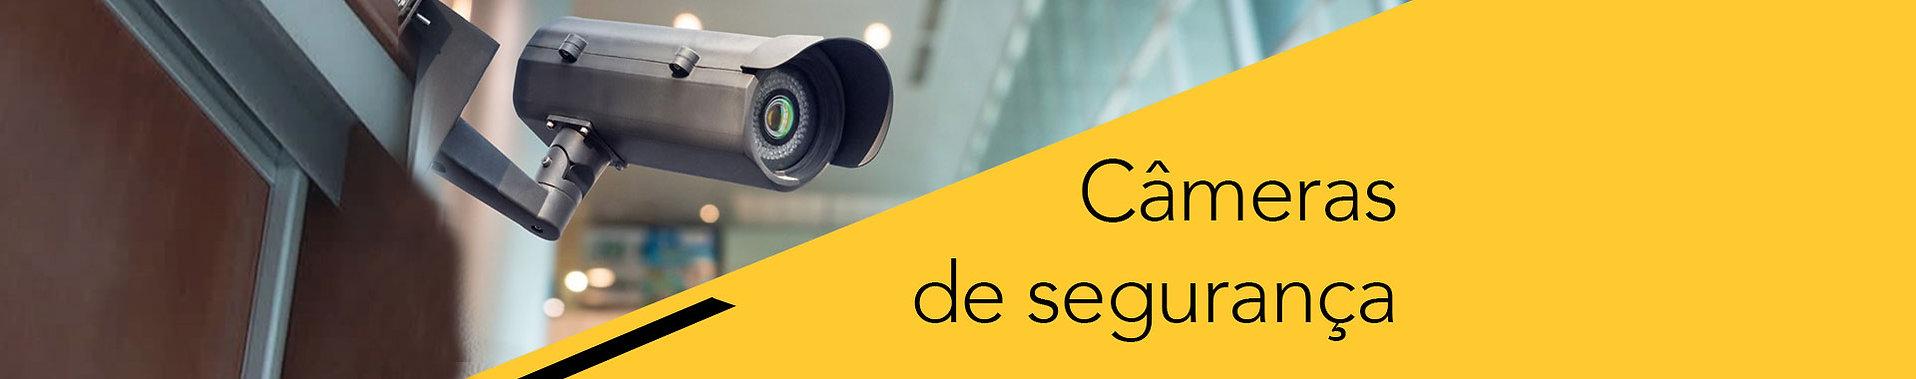 Topo_produtos_cameras.jpg